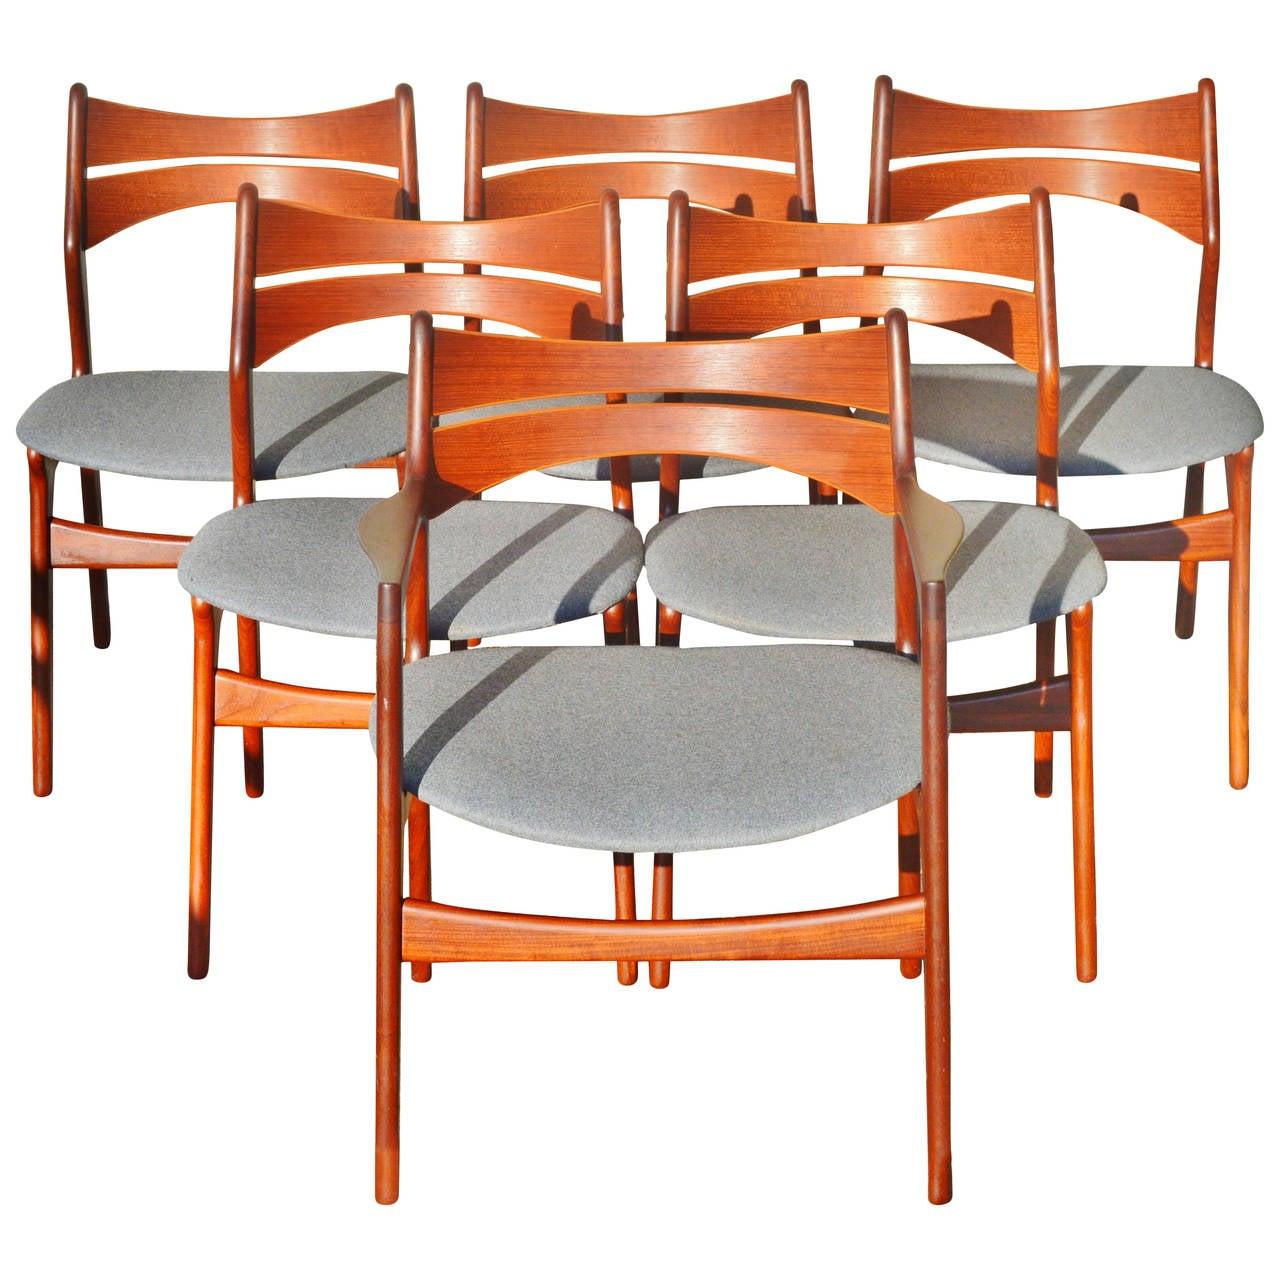 erik buck chairs office chair posture buy set six danish teak dining five side